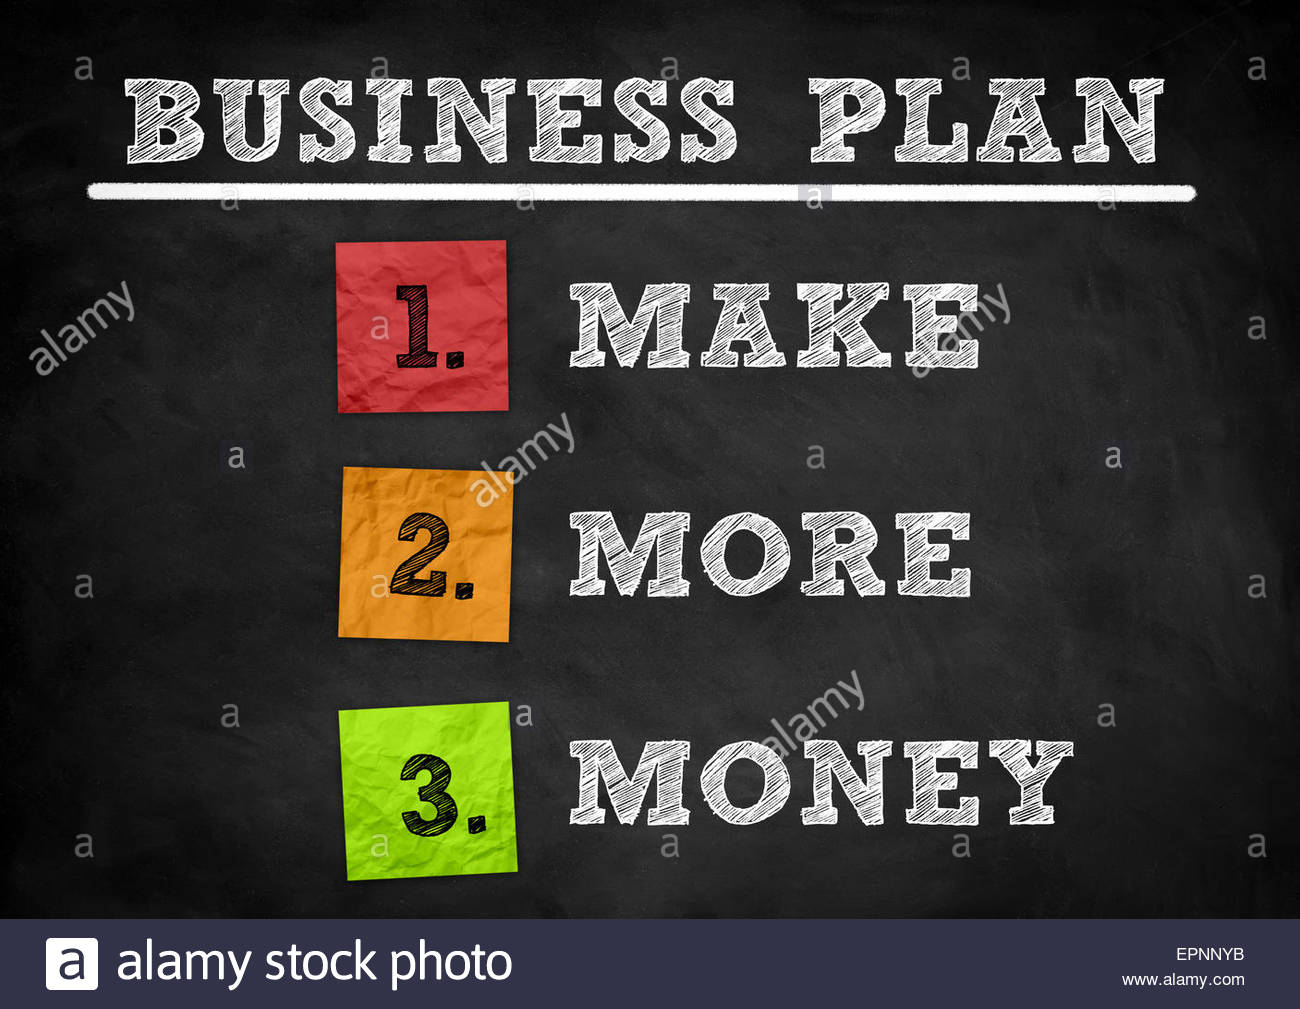 Business Plan - blackboard concept - Stock Image